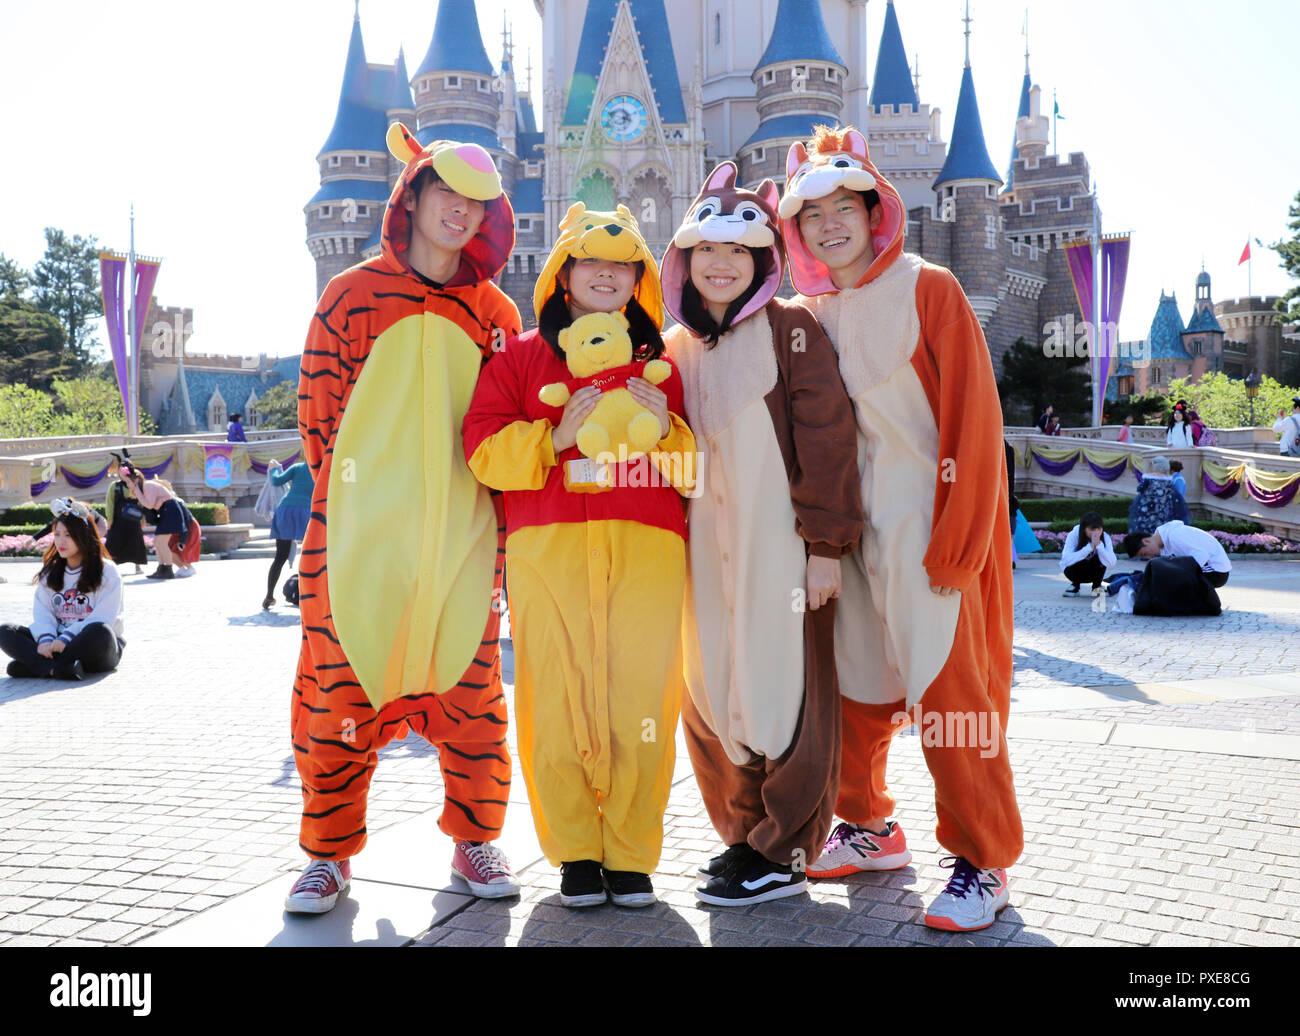 October 22 2018 Urayasu Japan Visitors Dressed In Costumes Of